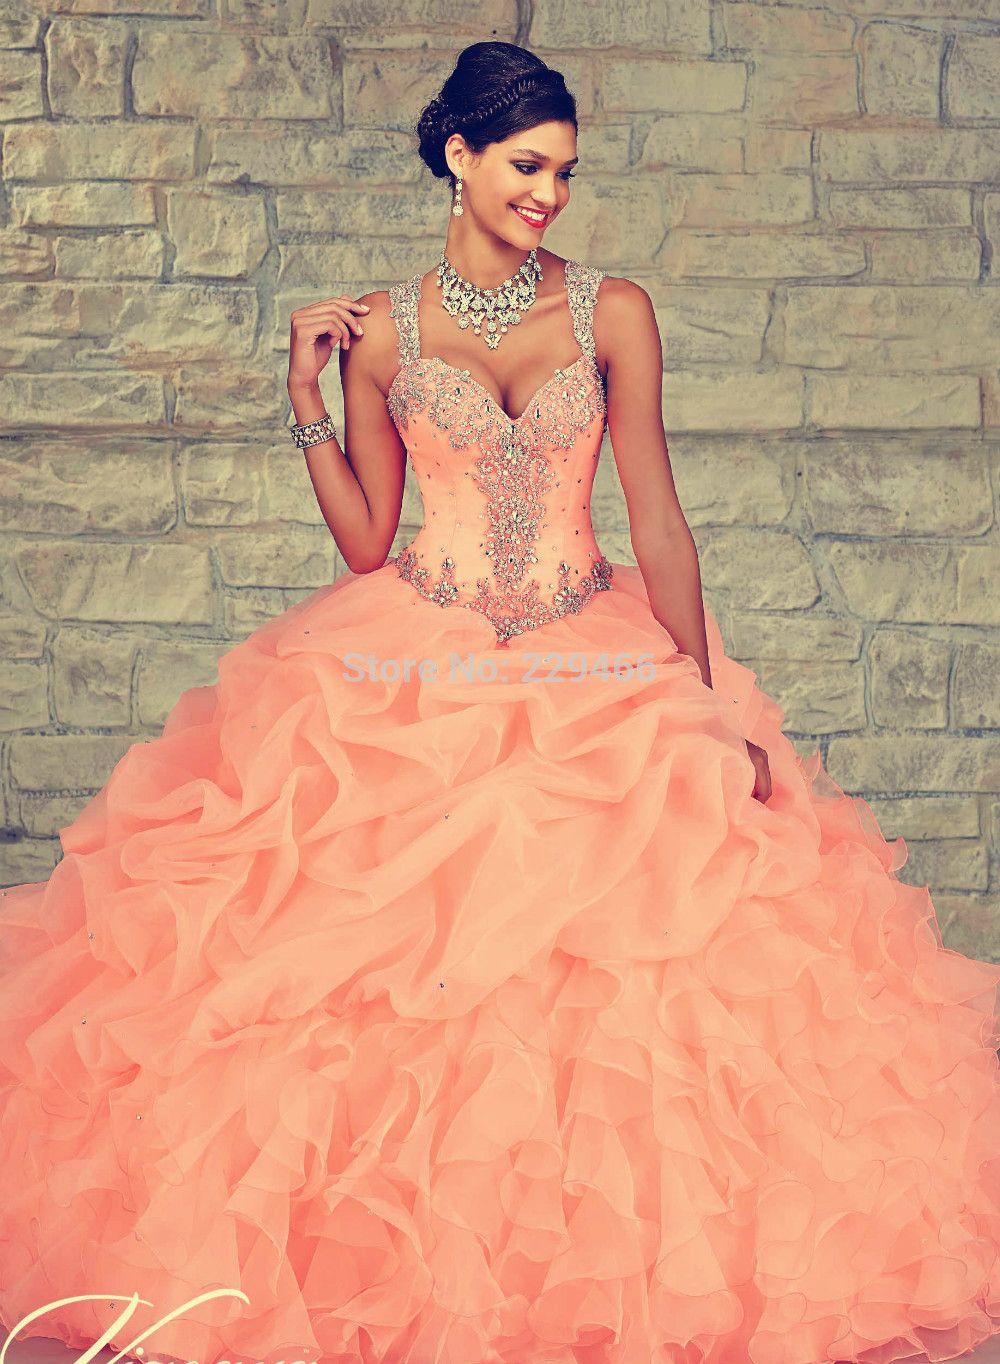 Short Fluffy Prom Dresses | Stuff to Buy | Pinterest | Prom